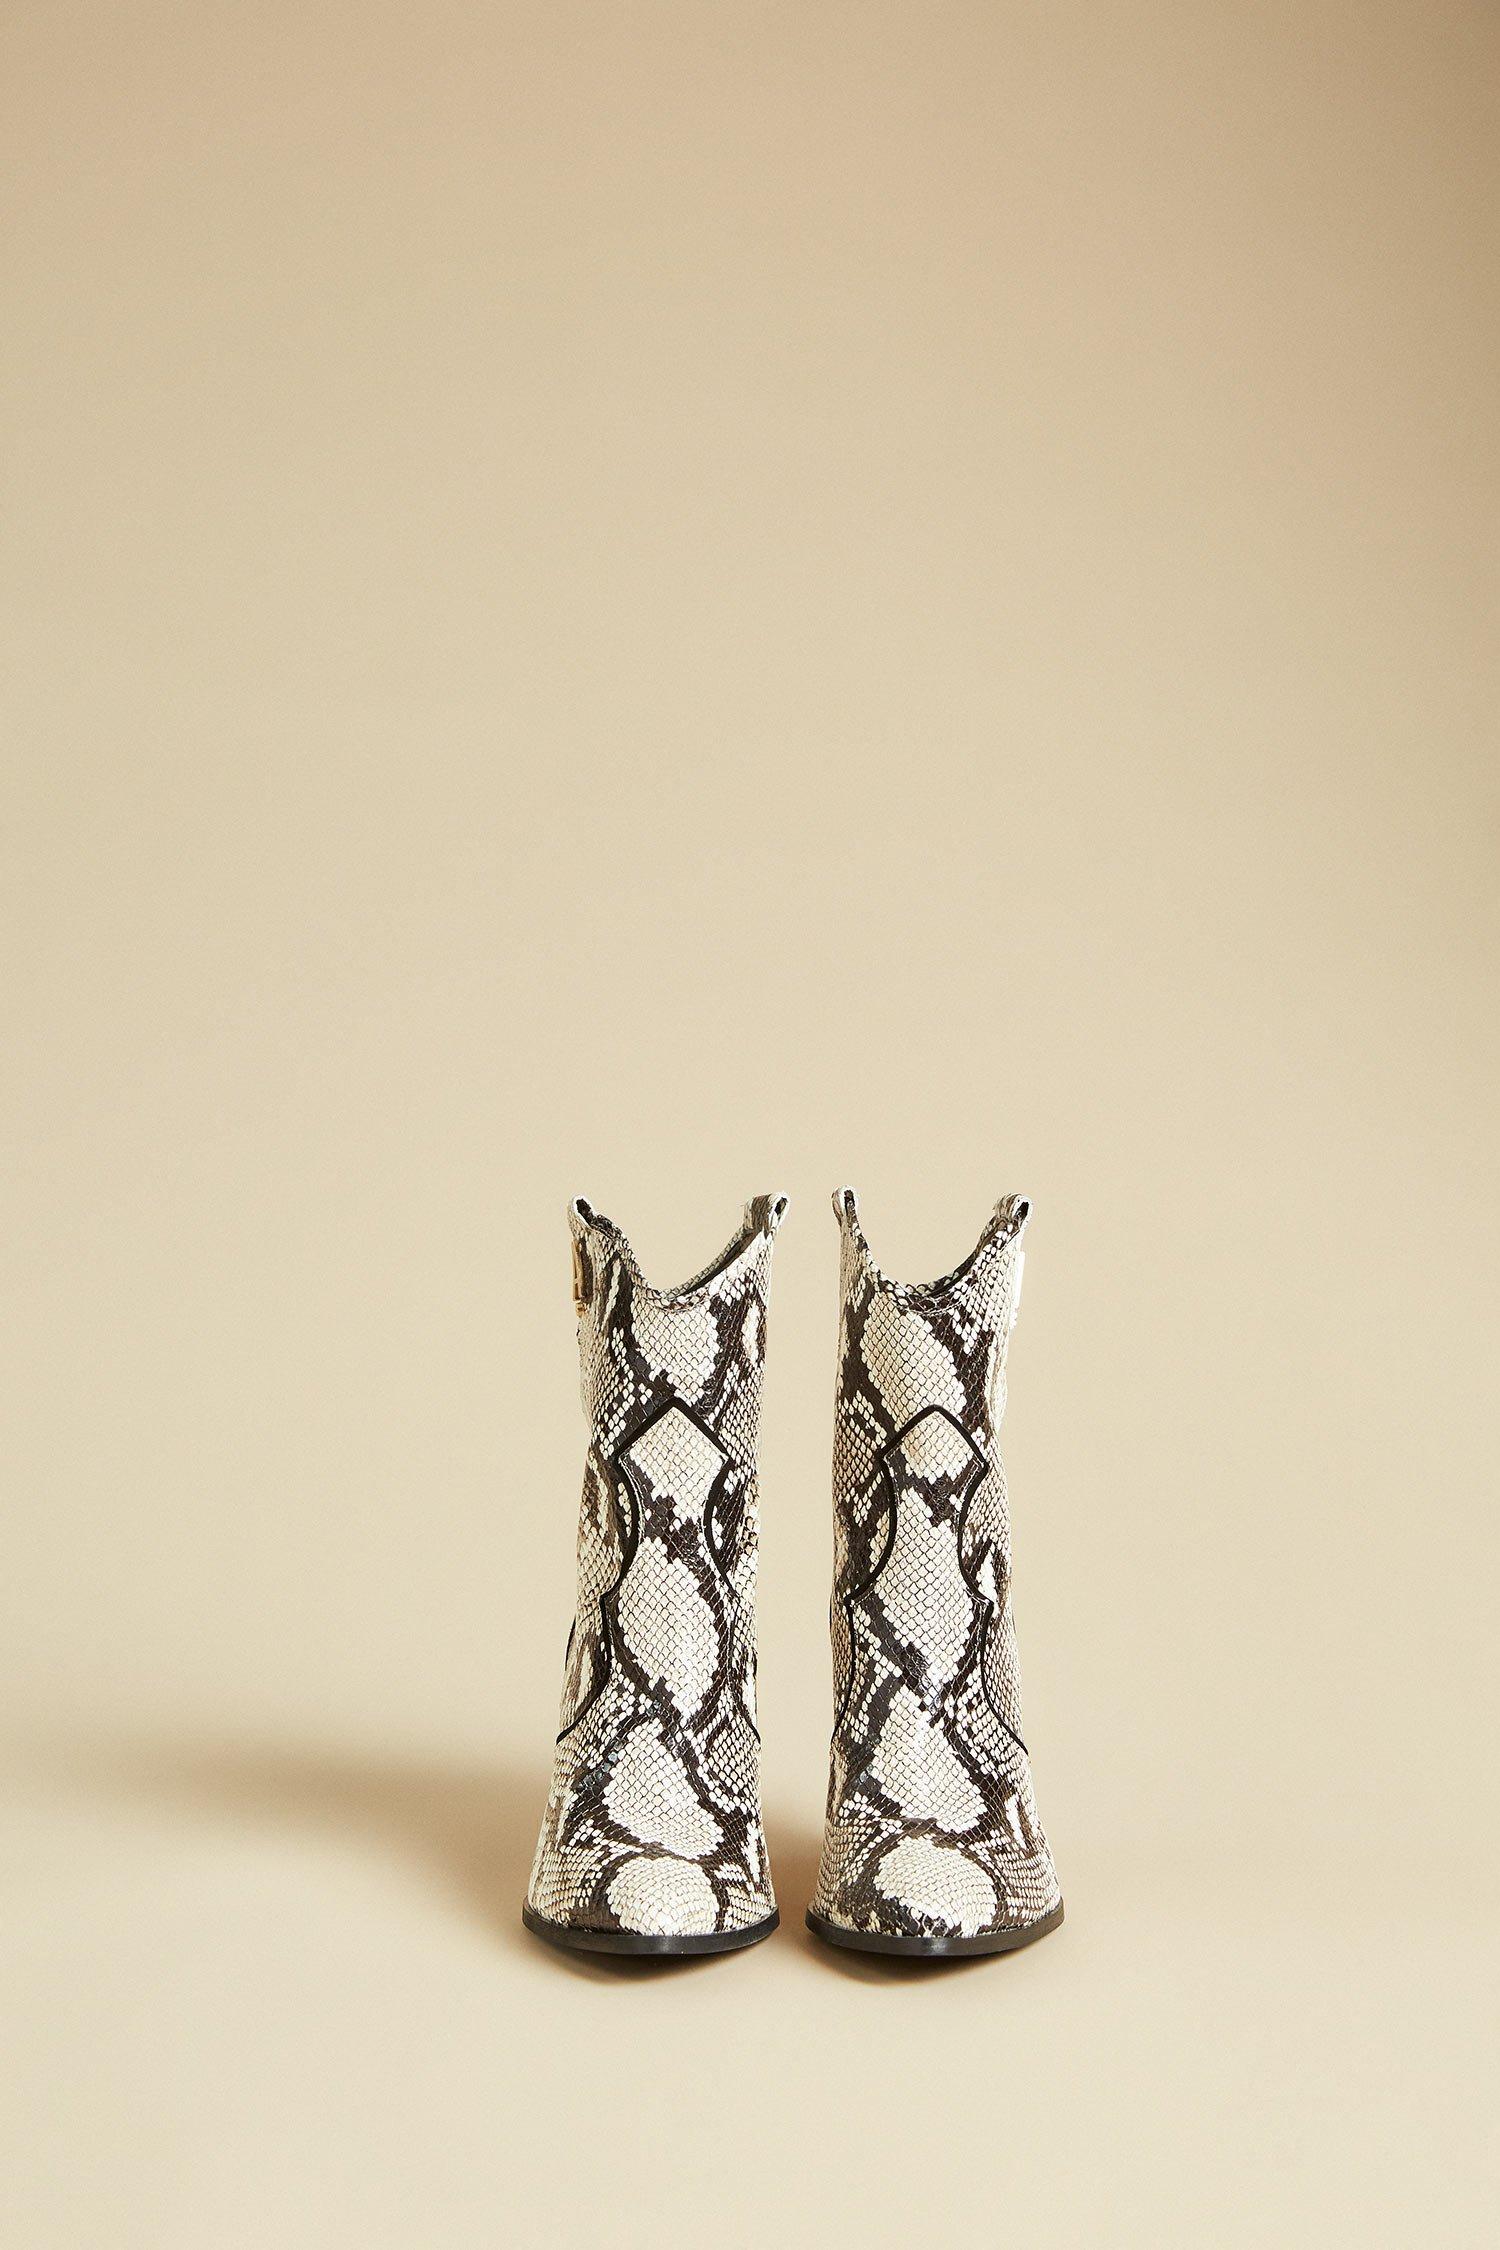 TEXAN PITON BOOTS